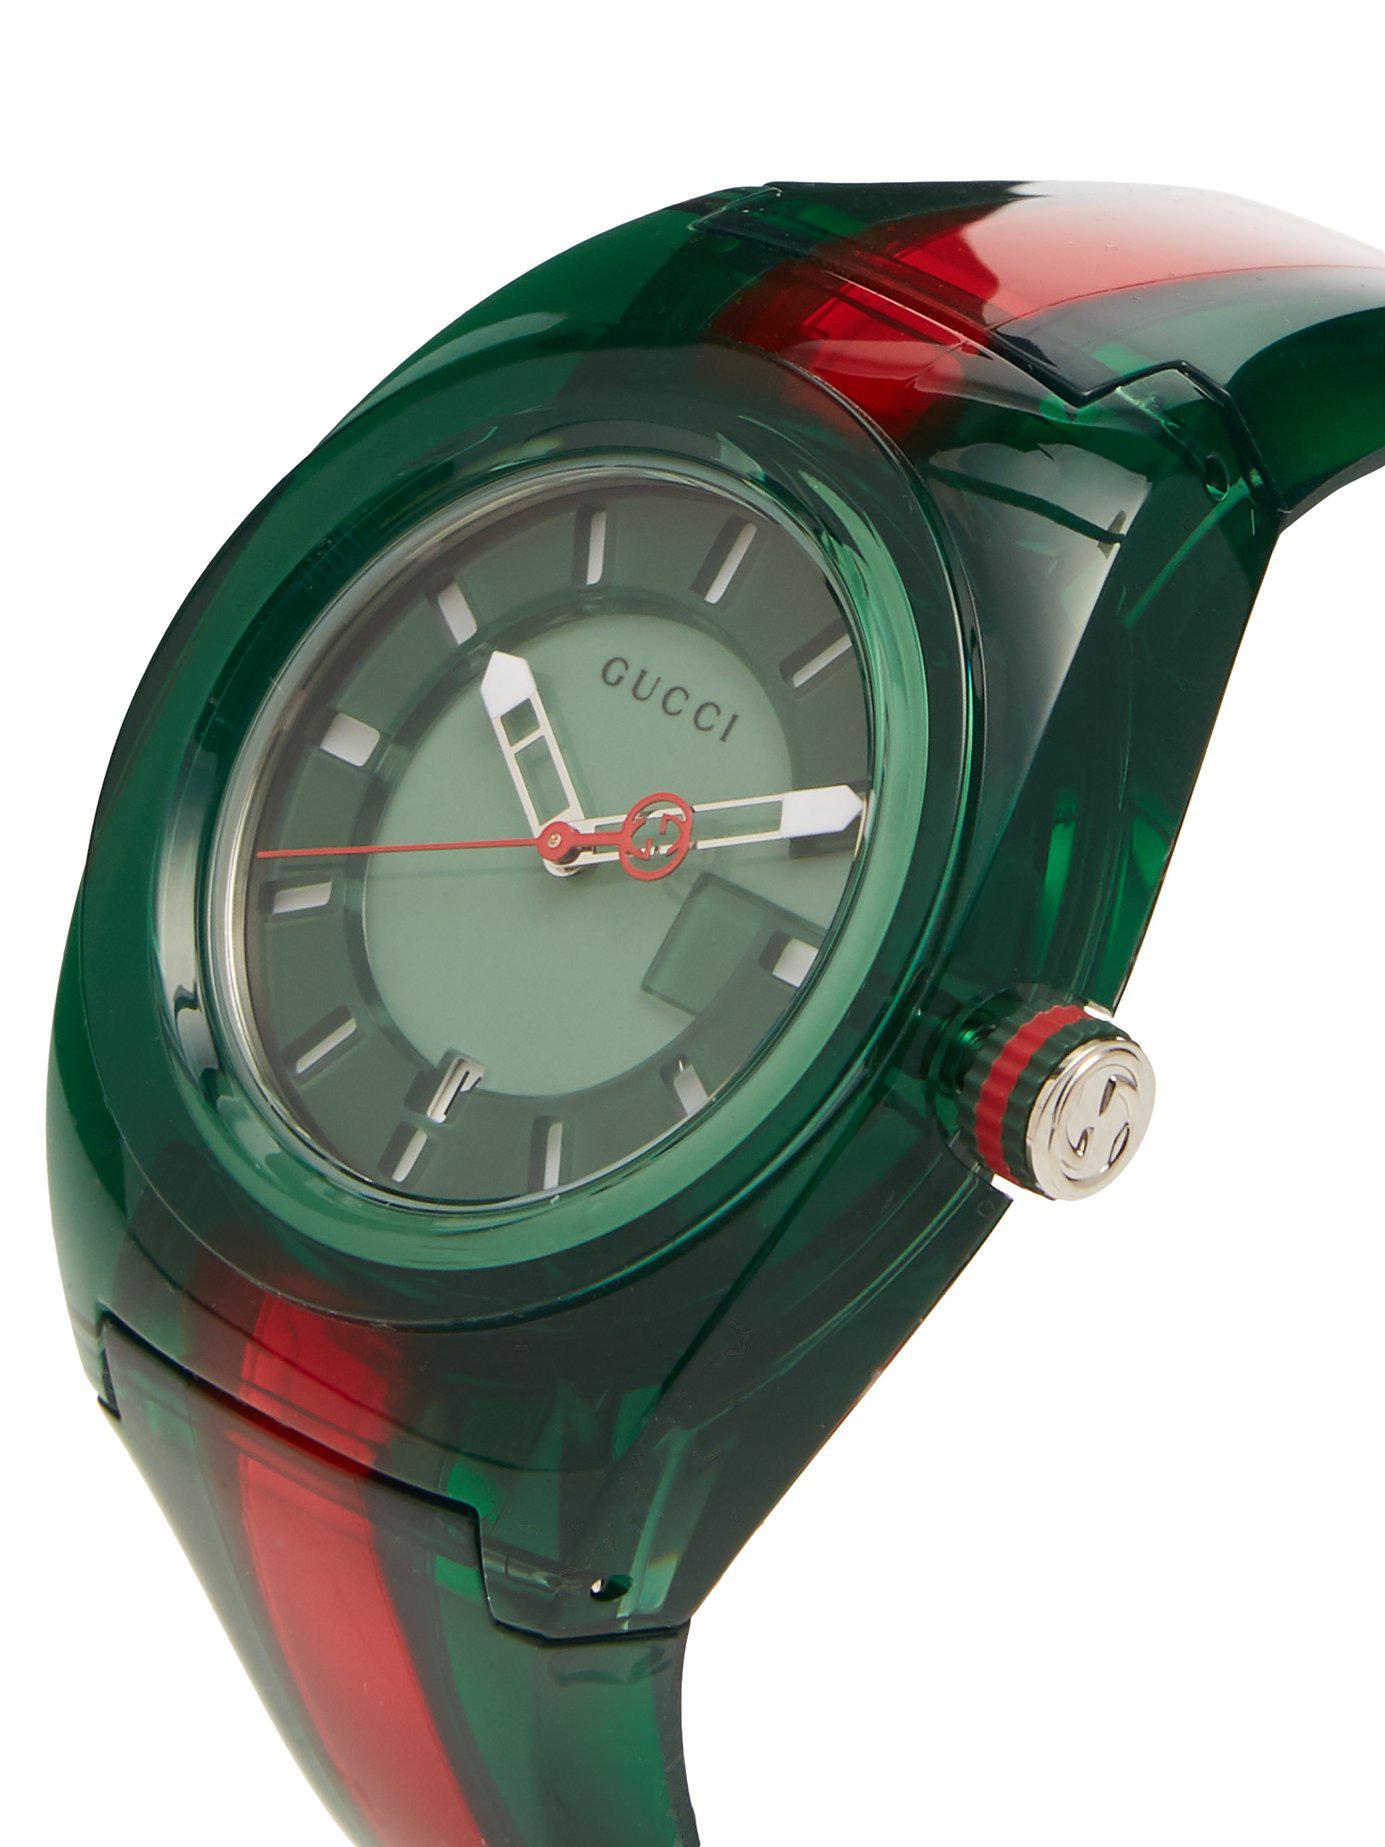 77e124ae641 Gucci - Green Sync Web Striped Watch for Men - Lyst. View fullscreen